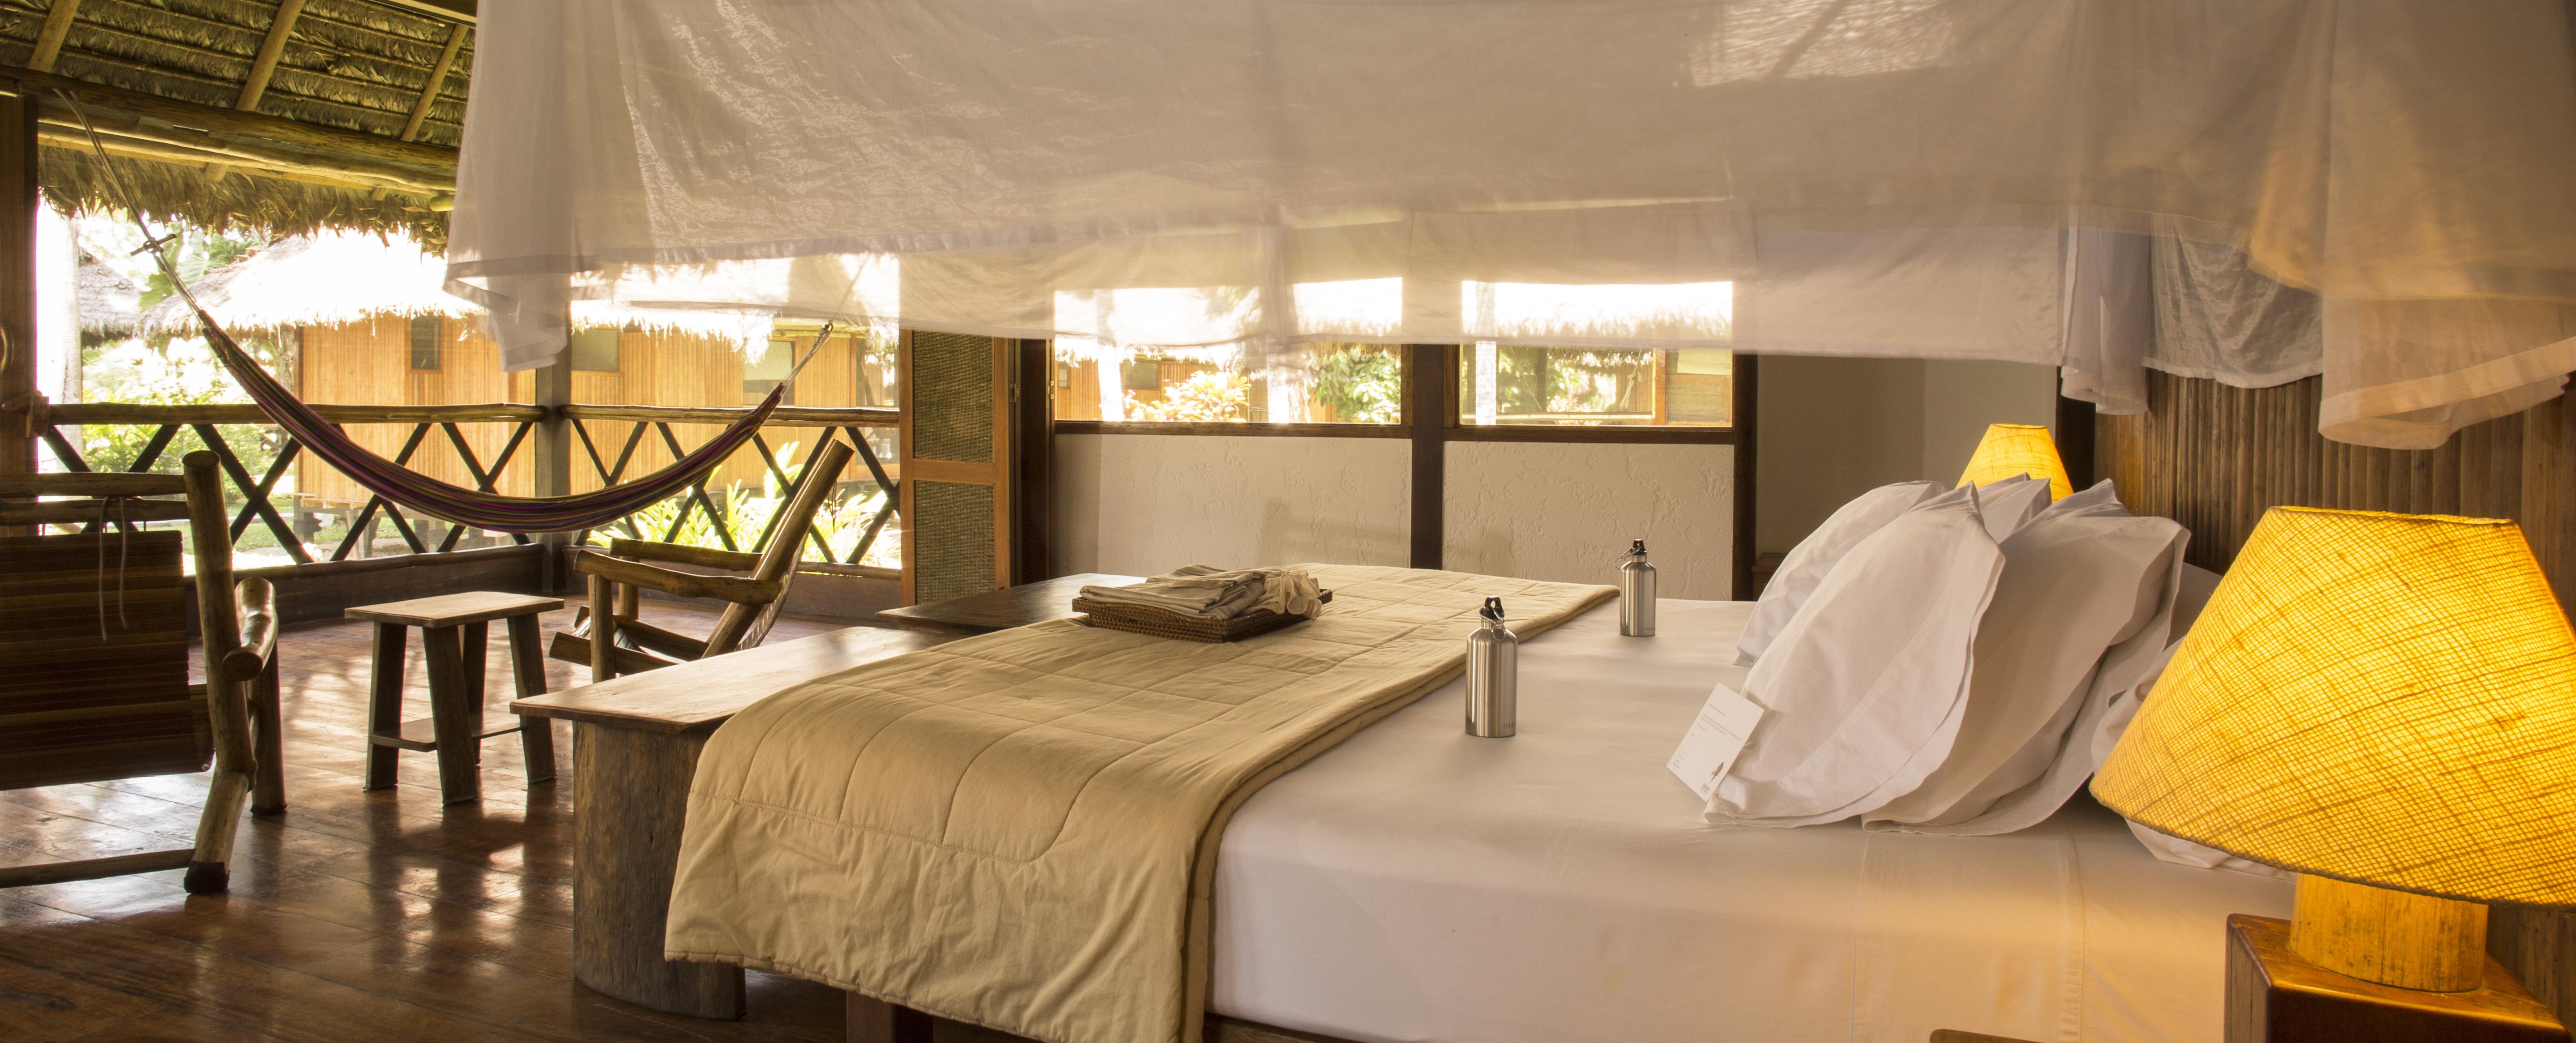 tailor-made-luxury-tour-amazon-river